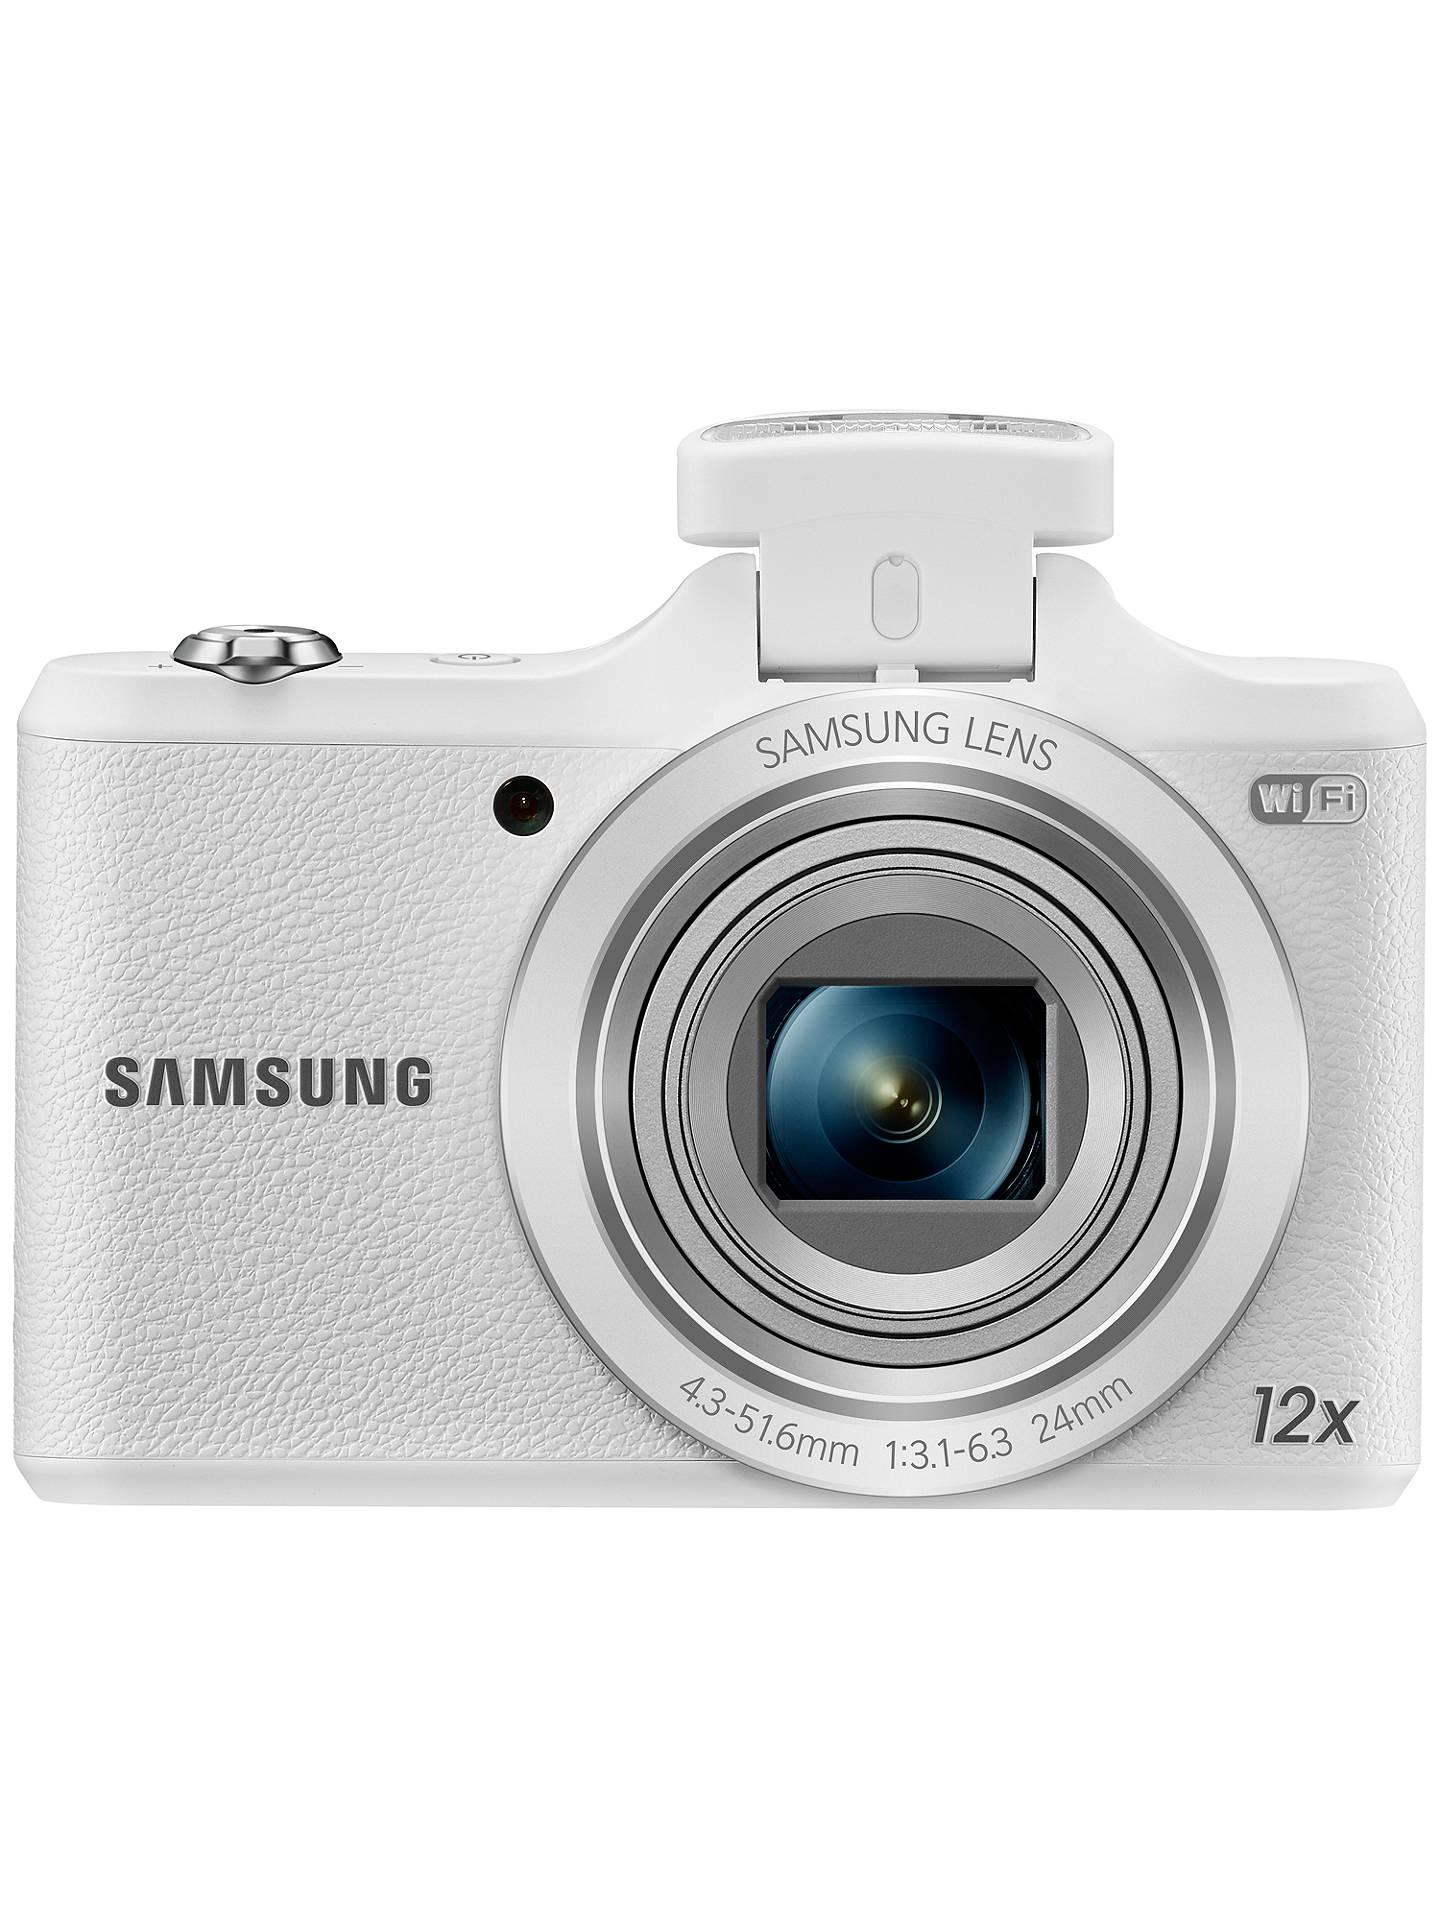 Samsung WB50F Digital Camera, HD 720p, 16MP, 12x Optical